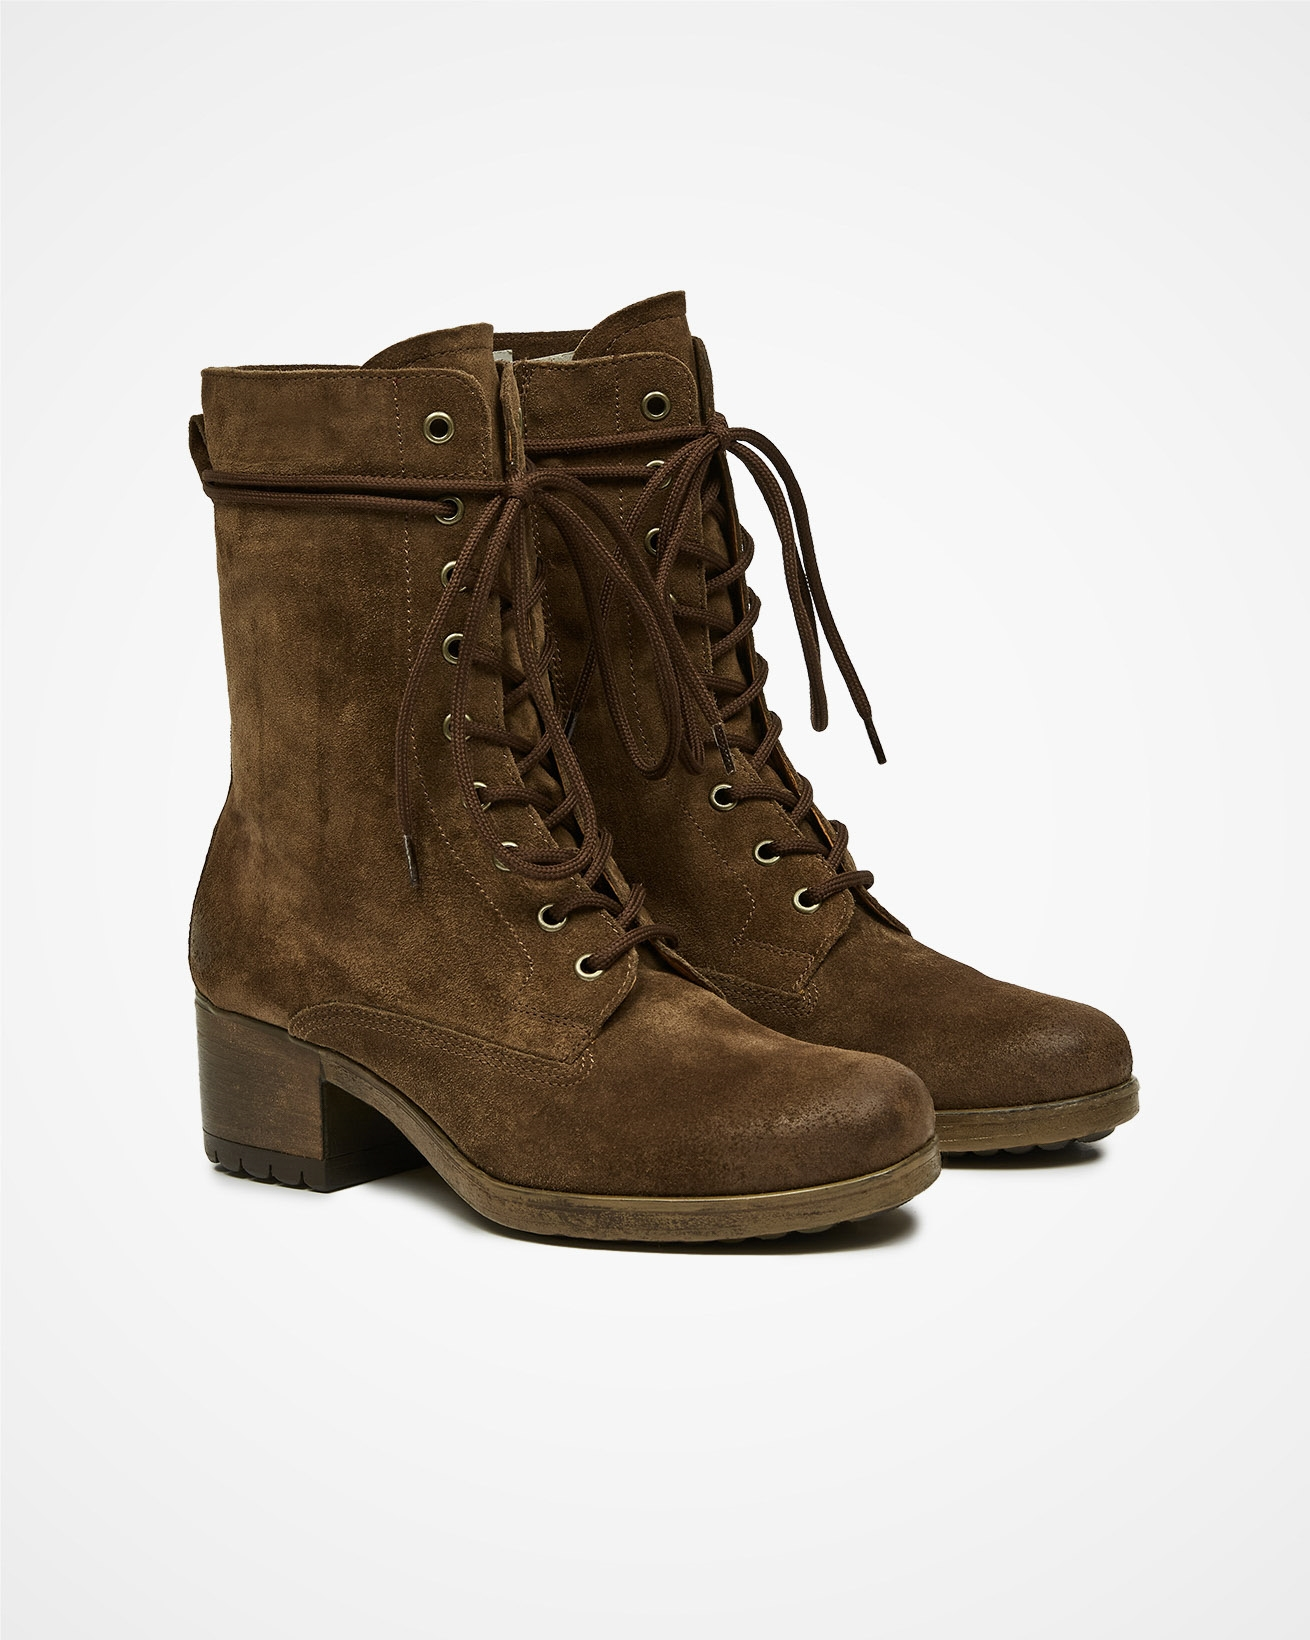 7794_block-heel-derby-boot_autumn-brown_1_cutout.jpg